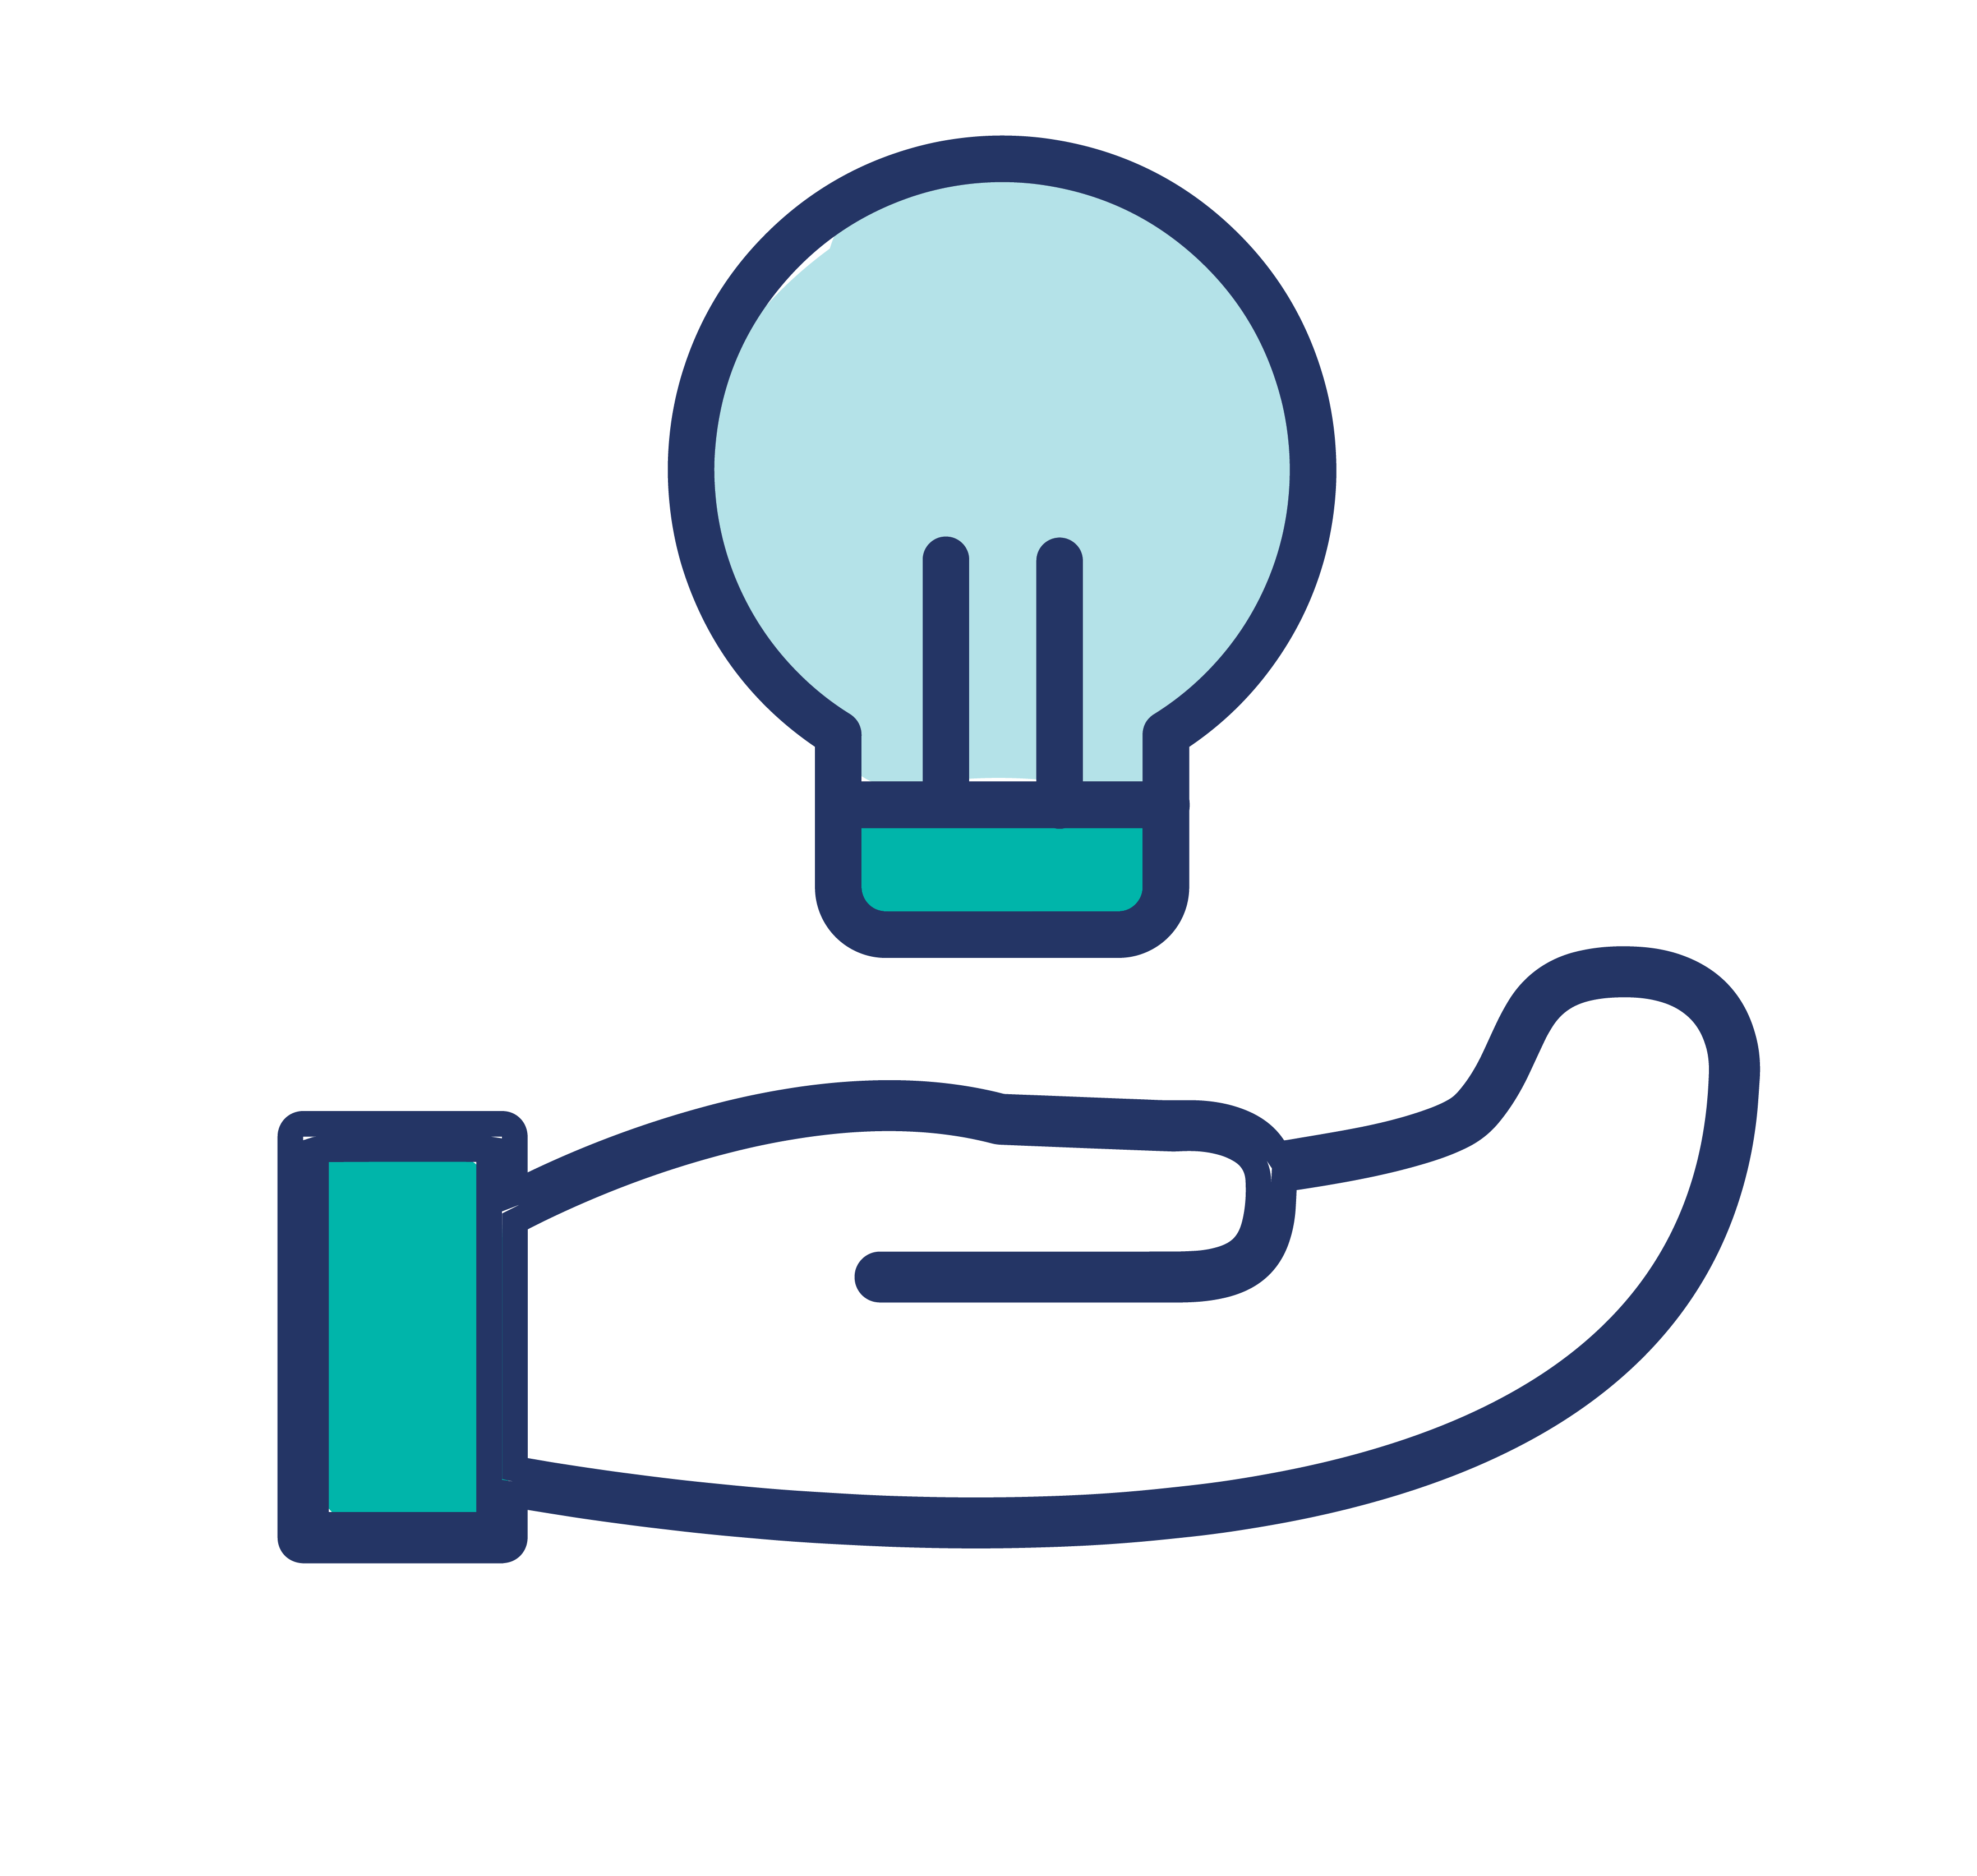 Icon: Hand holding a lightbulb